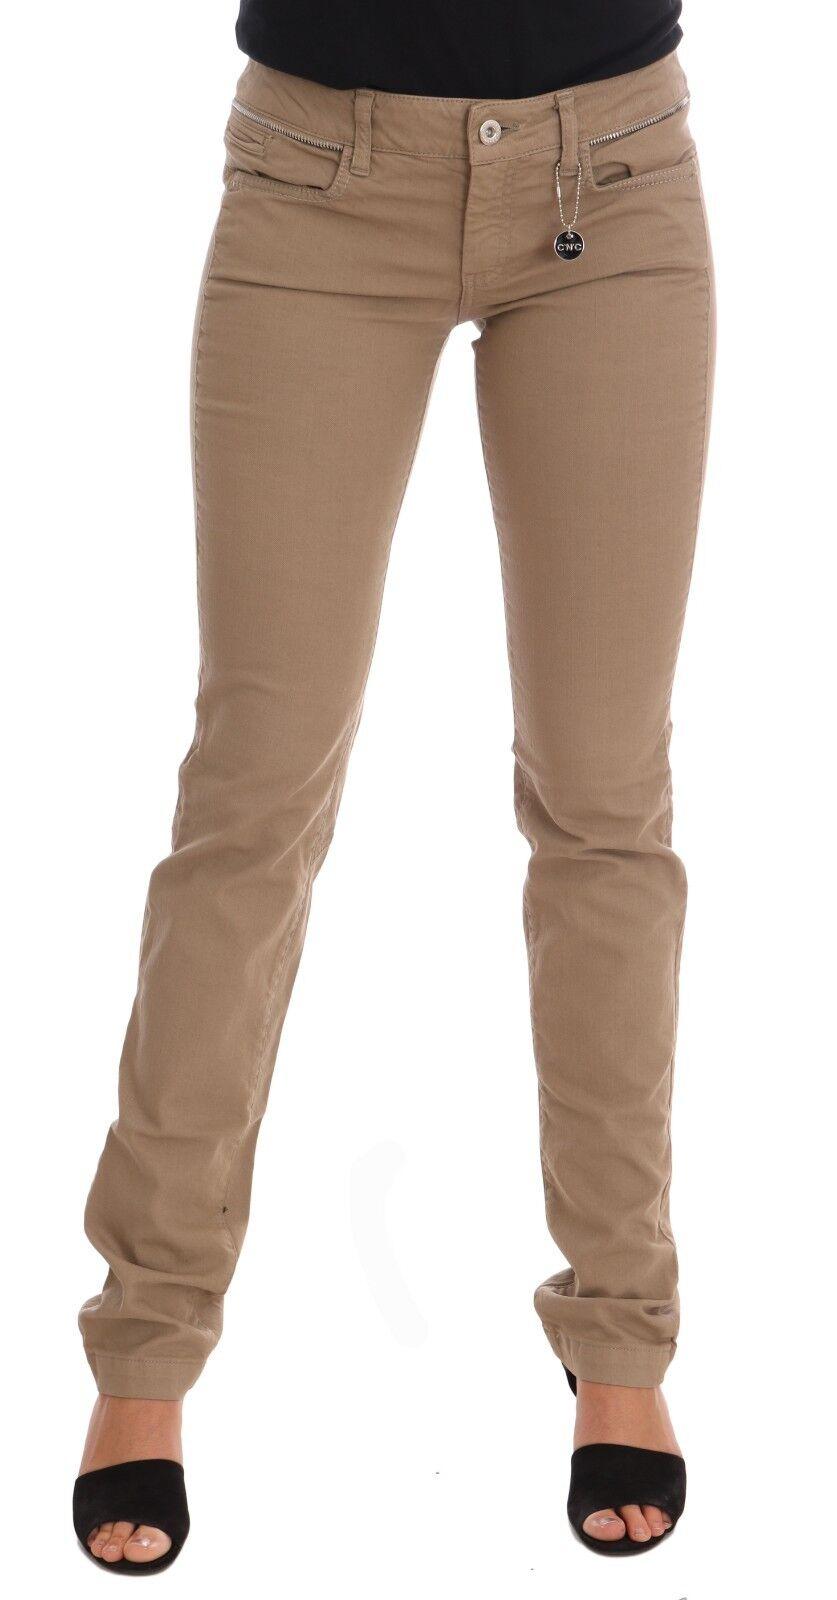 NEW  280 CoSTUME NATIONAL C'N'C Jeans Denim Beige Cotton Stretch Slim Fit s. W26